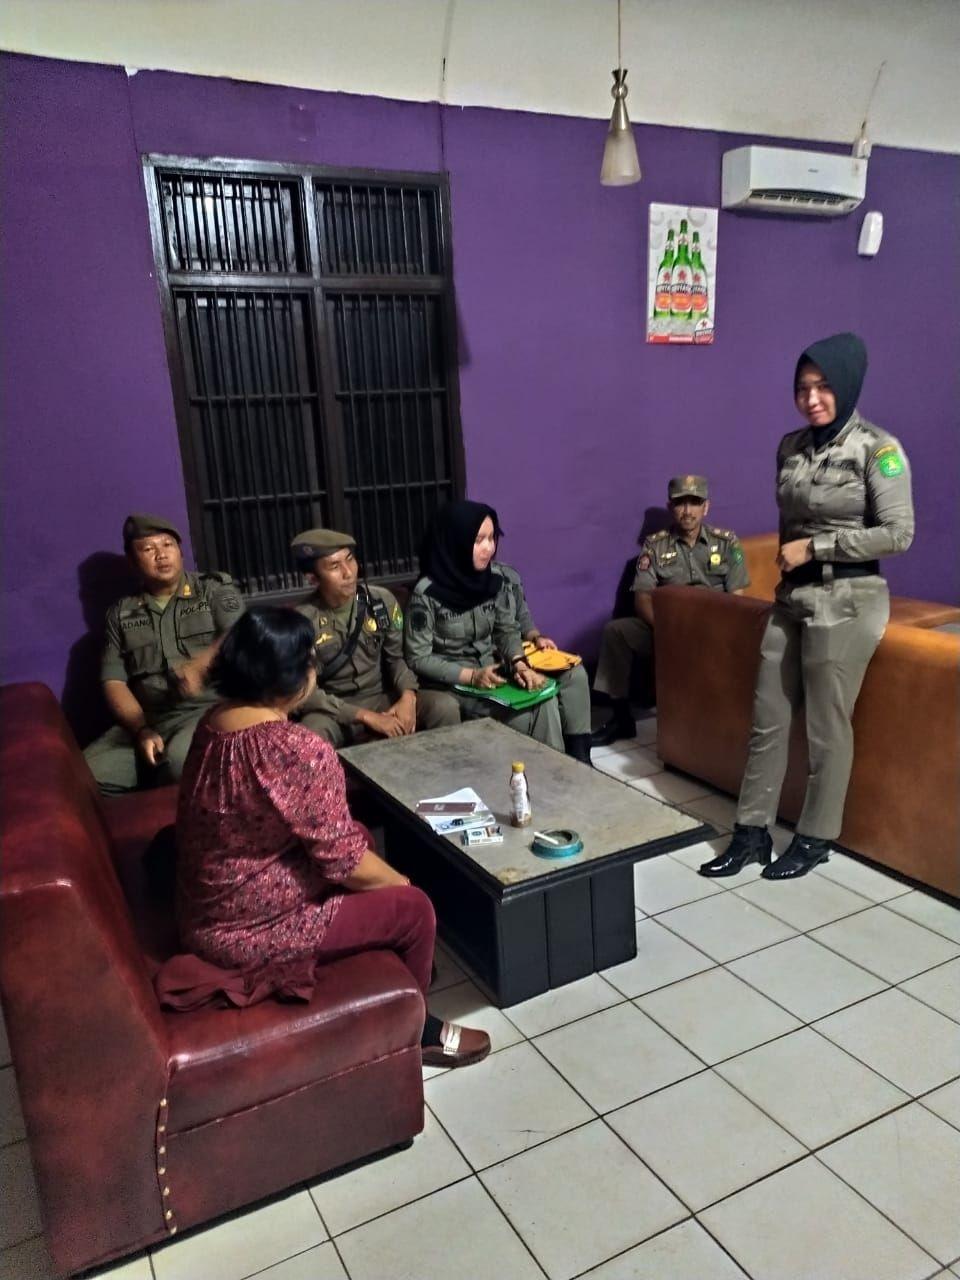 Cegah Praktik Prostisusi di Sangatta,Satpol PP Merazia 6 THM